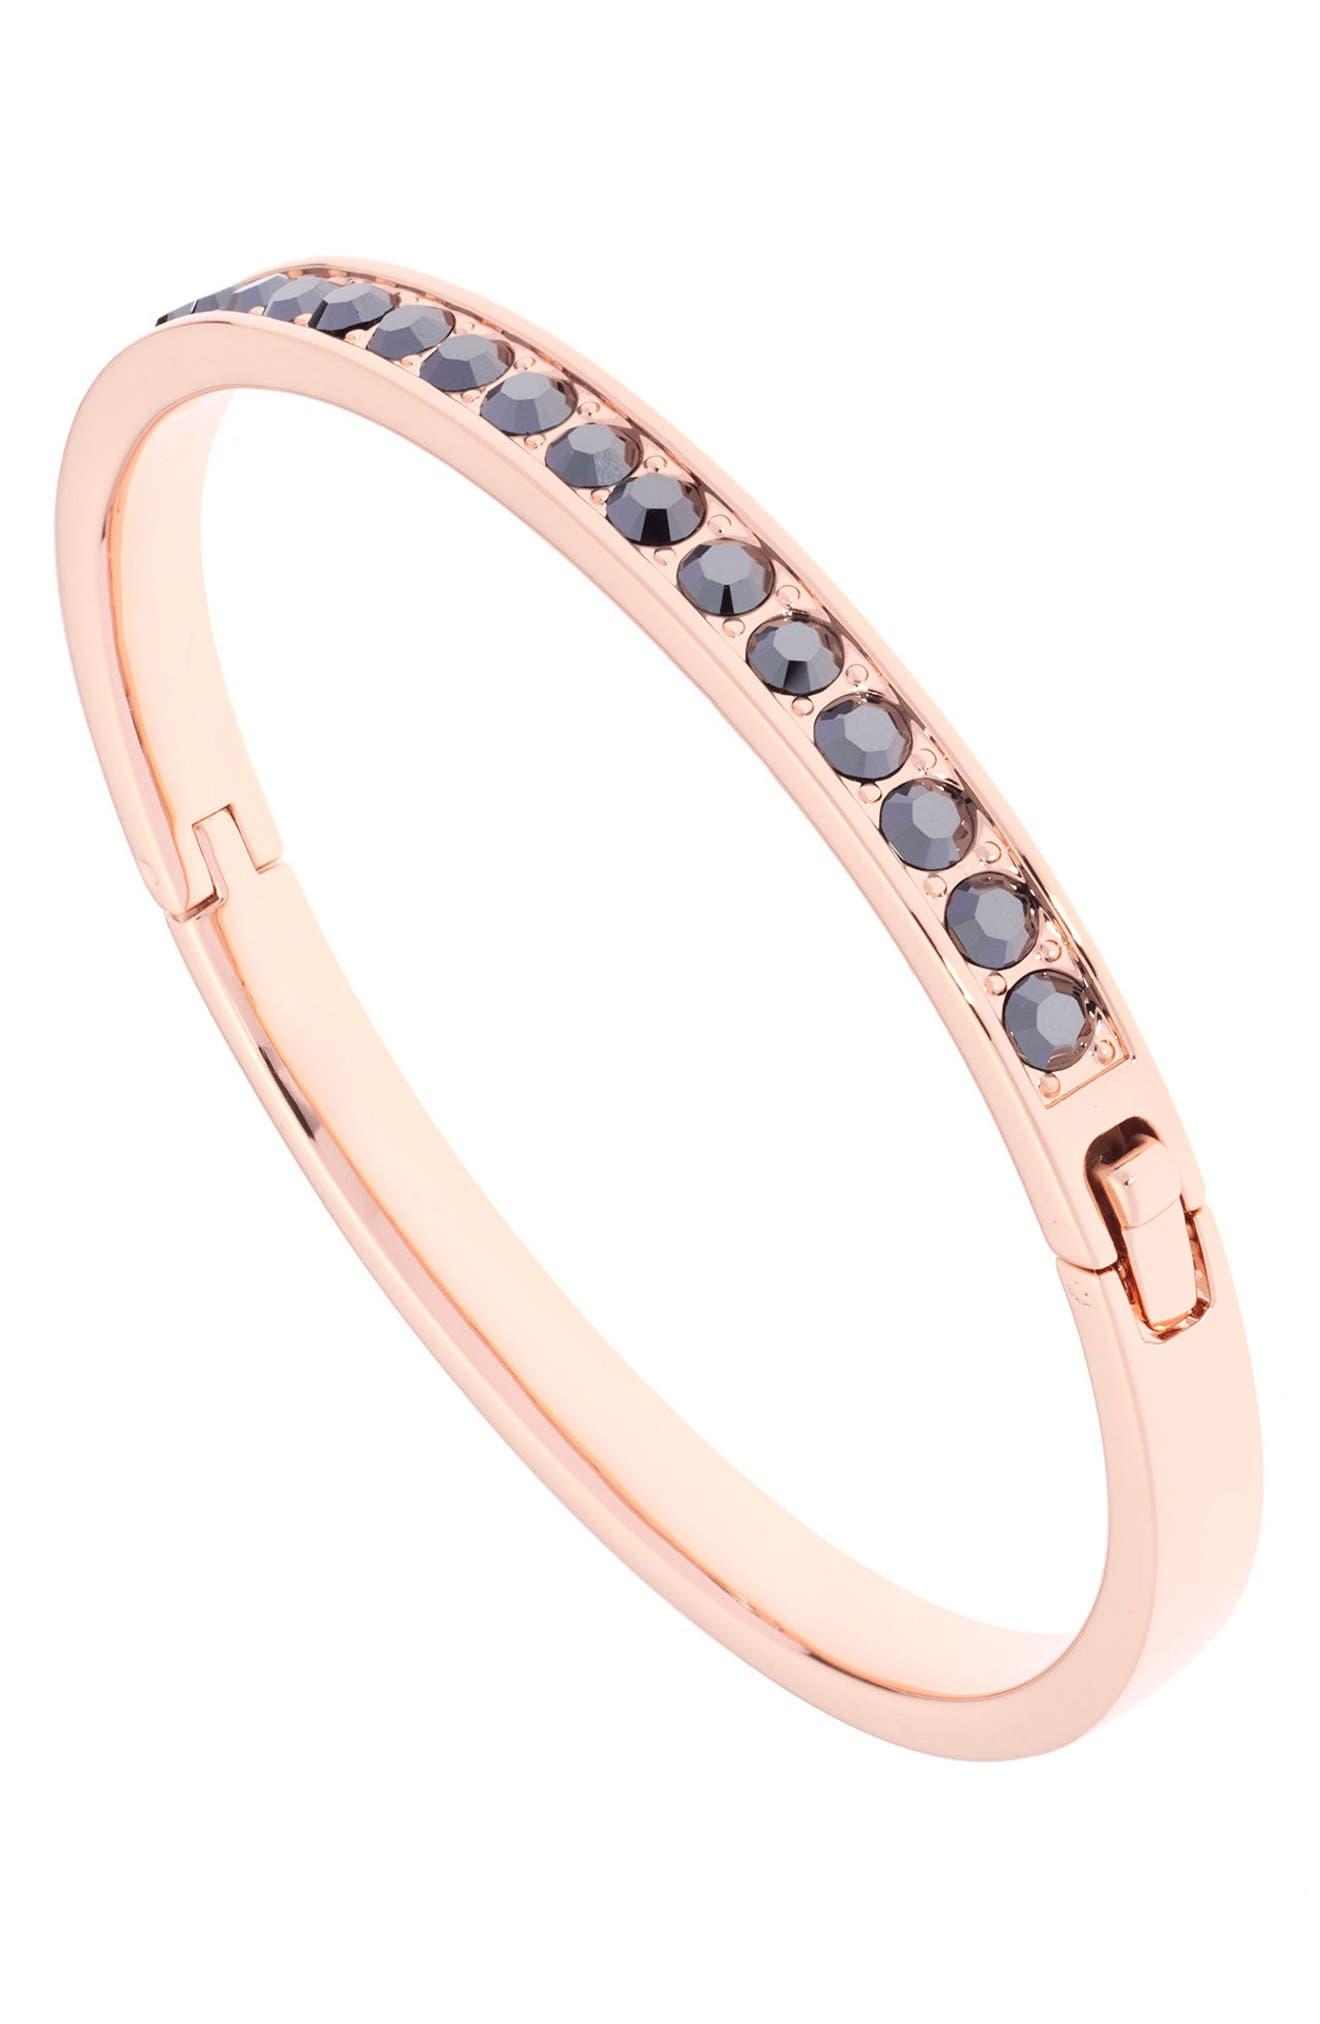 Clemara Hinge Bangle Bracelet,                             Alternate thumbnail 2, color,                             001